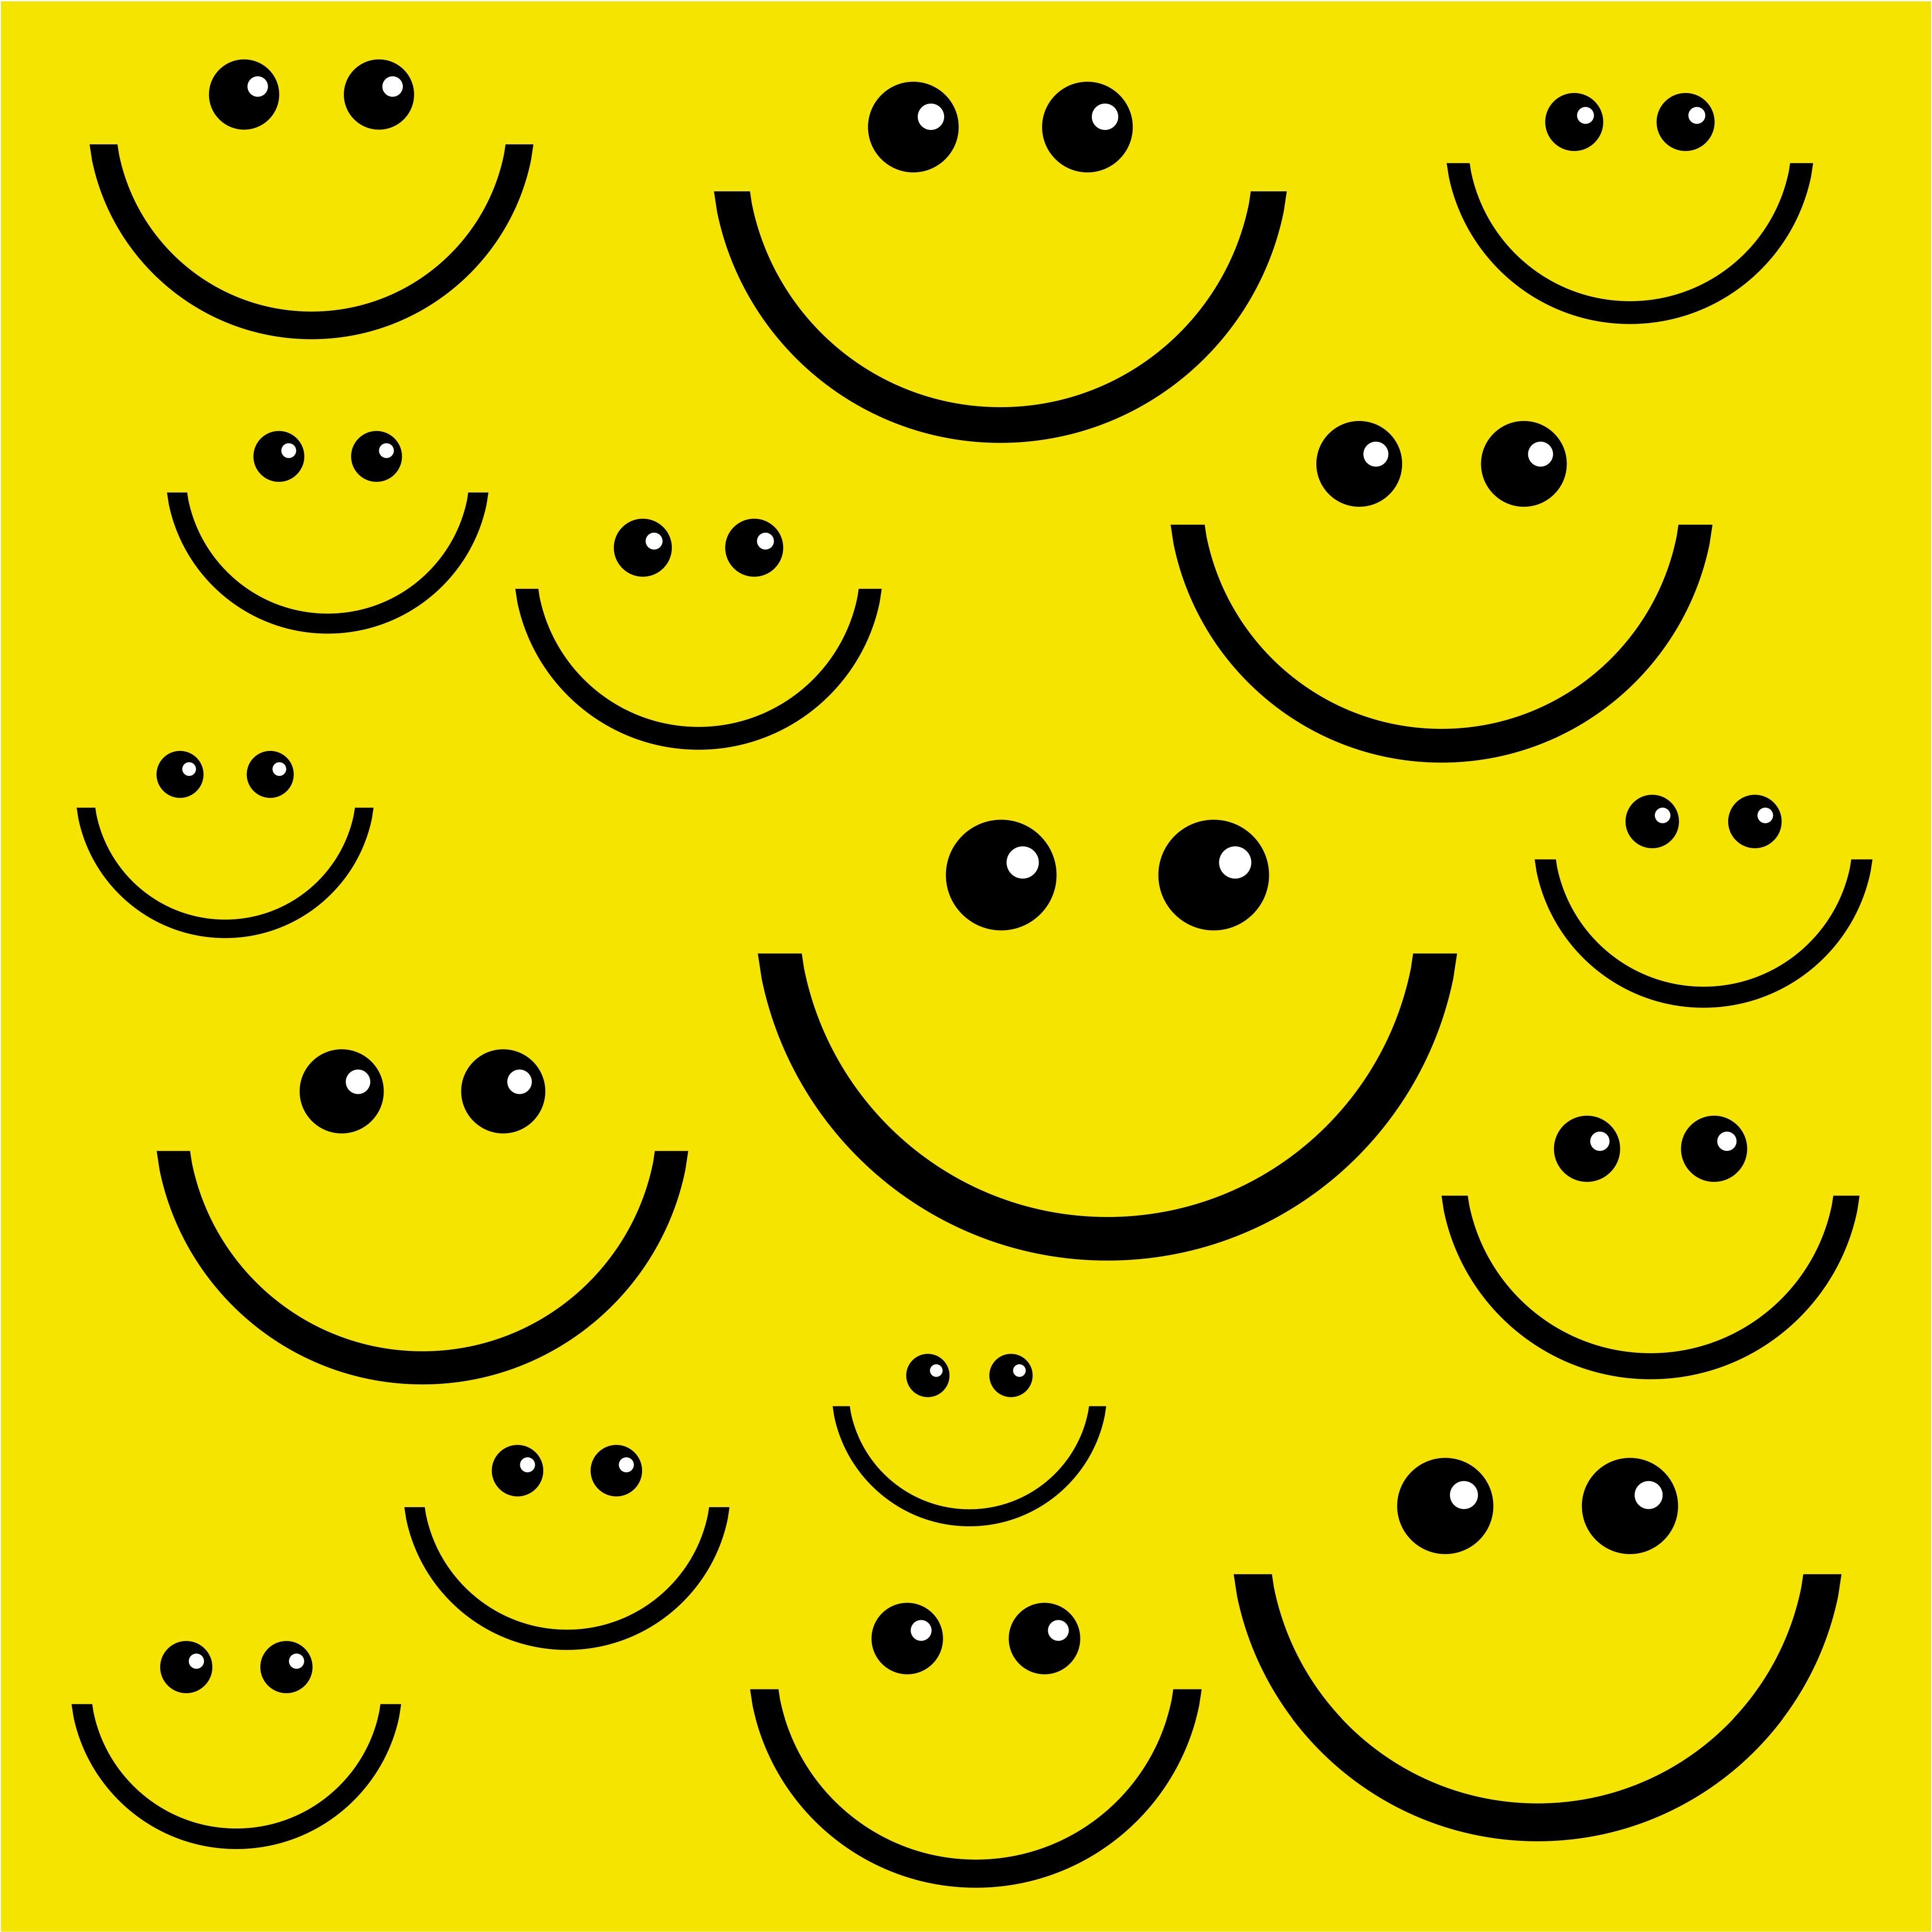 hogyan legyünk boldogok